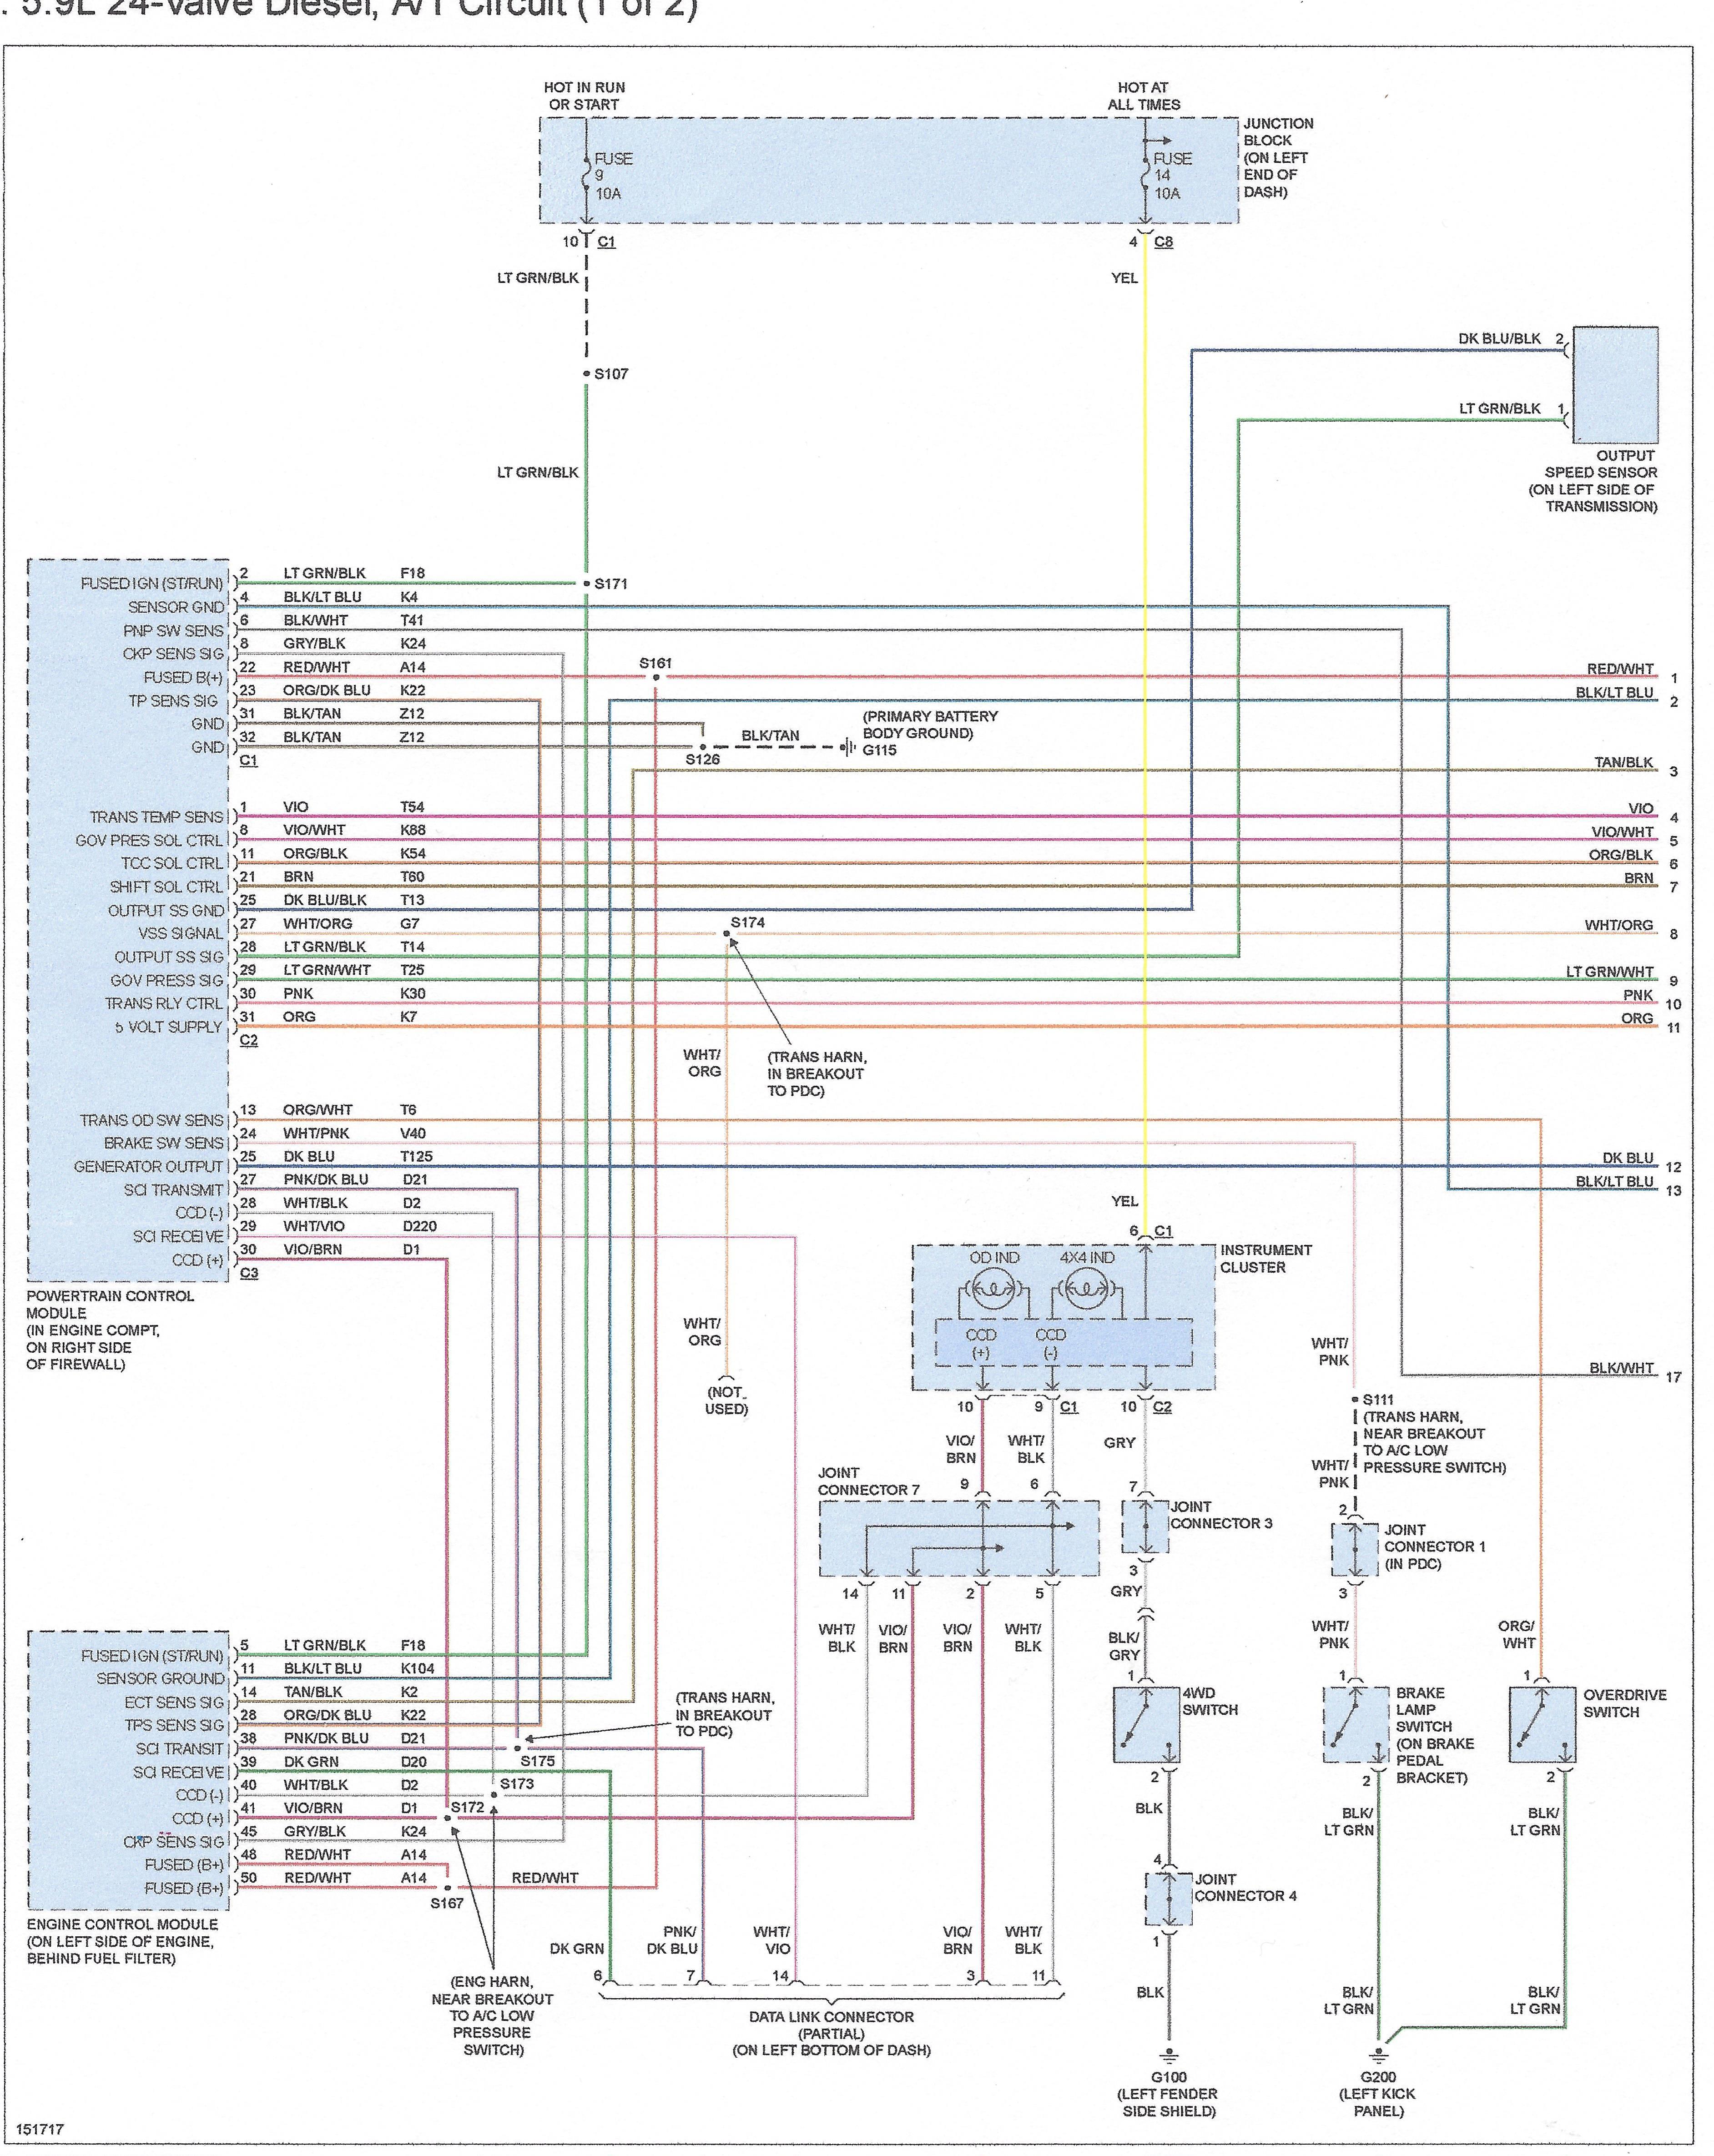 Dodge Ram Parts Diagram Dodge Ram Tcc Wiring Diagram Wiring Diagram Of Dodge Ram Parts Diagram